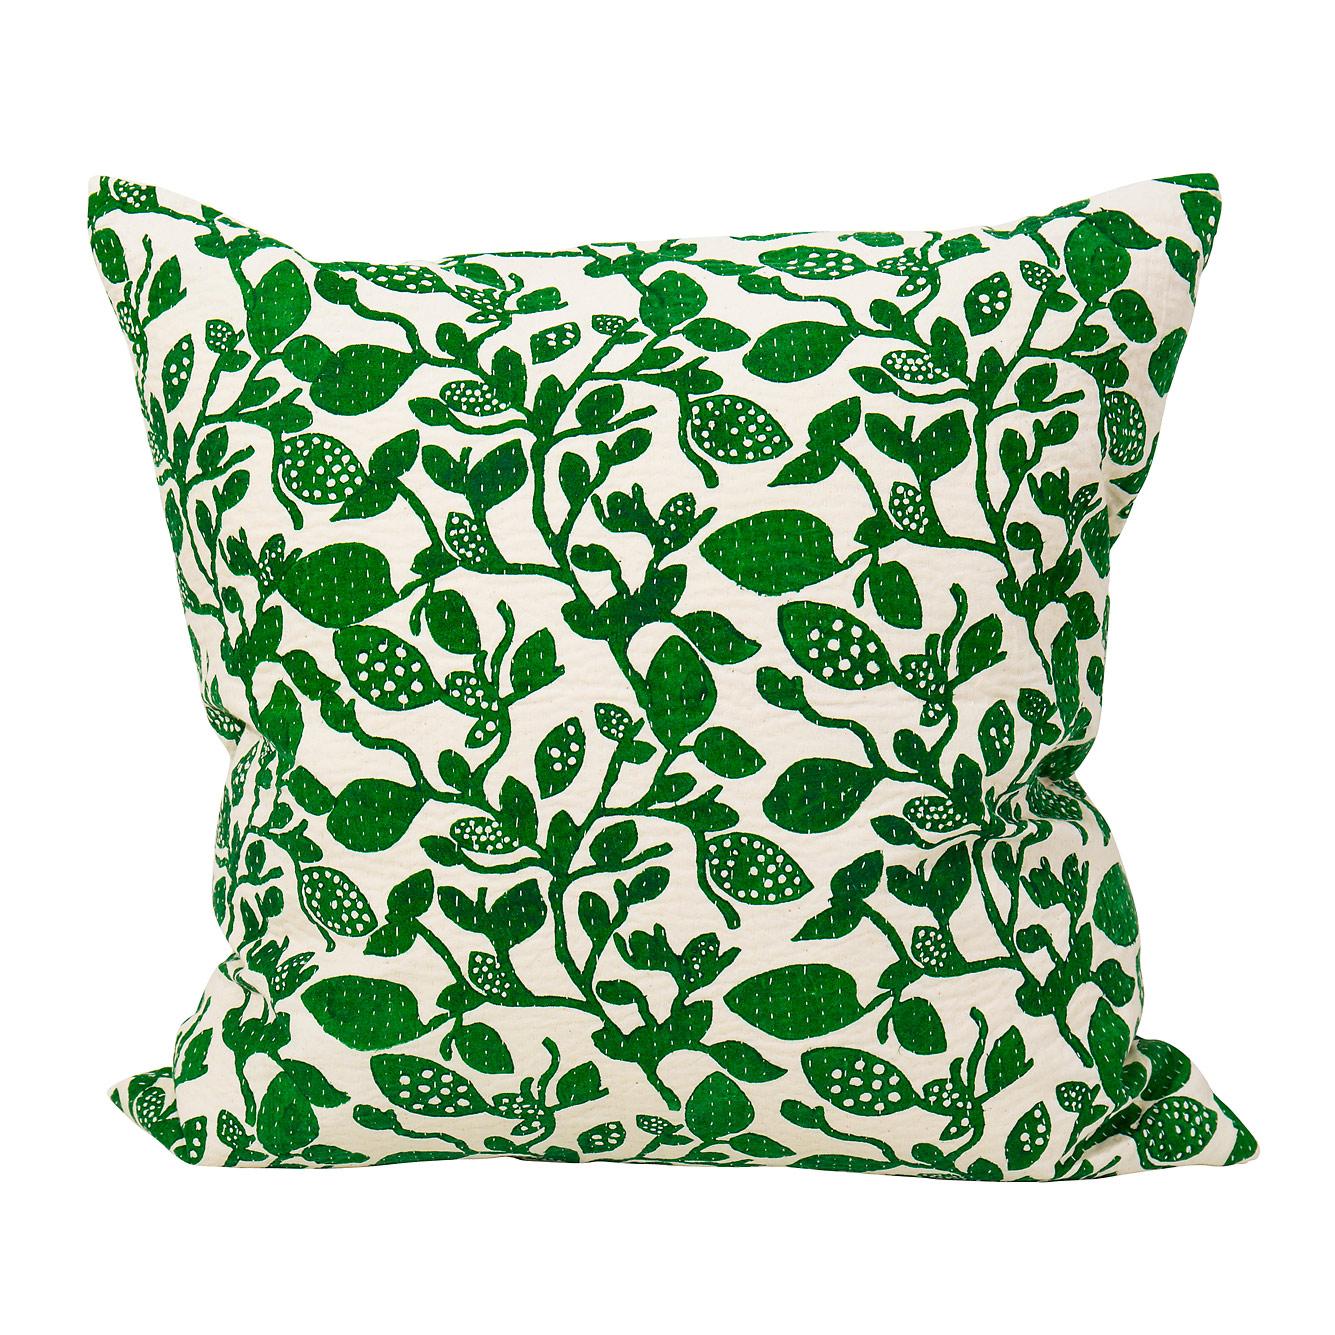 Birch Cushion Cover 50x50cm, Mix